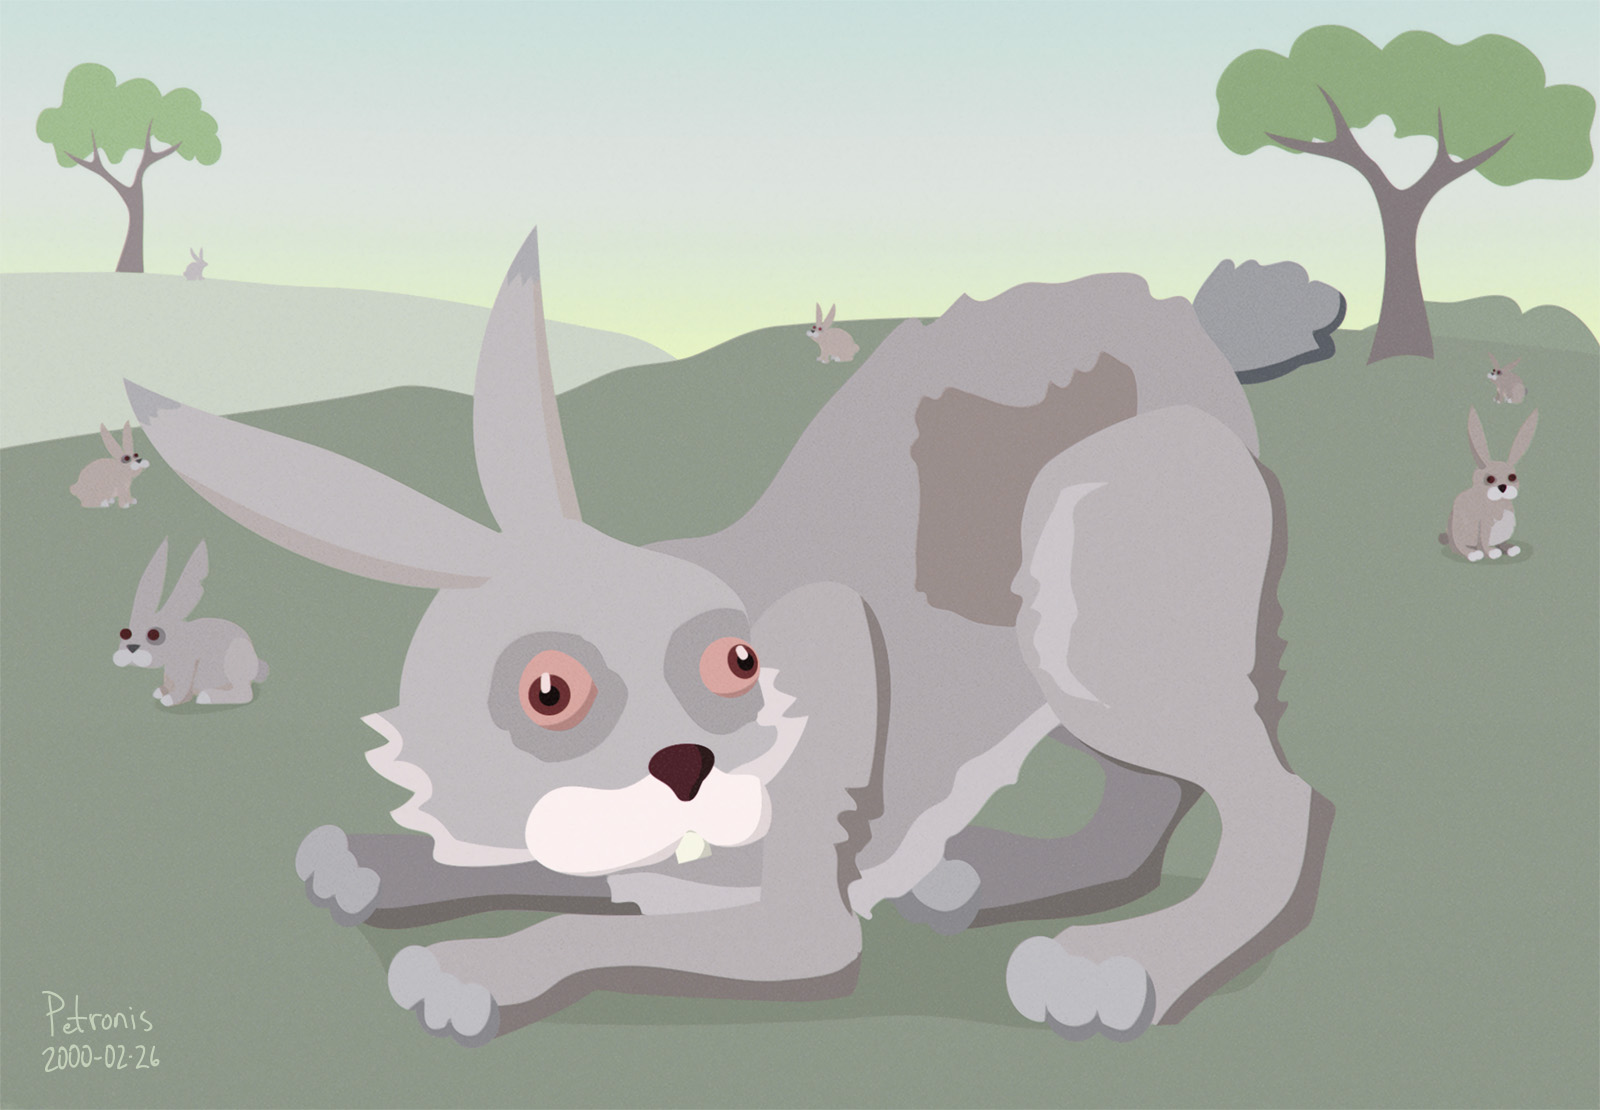 Red-Eyed Cartoon Rabbit